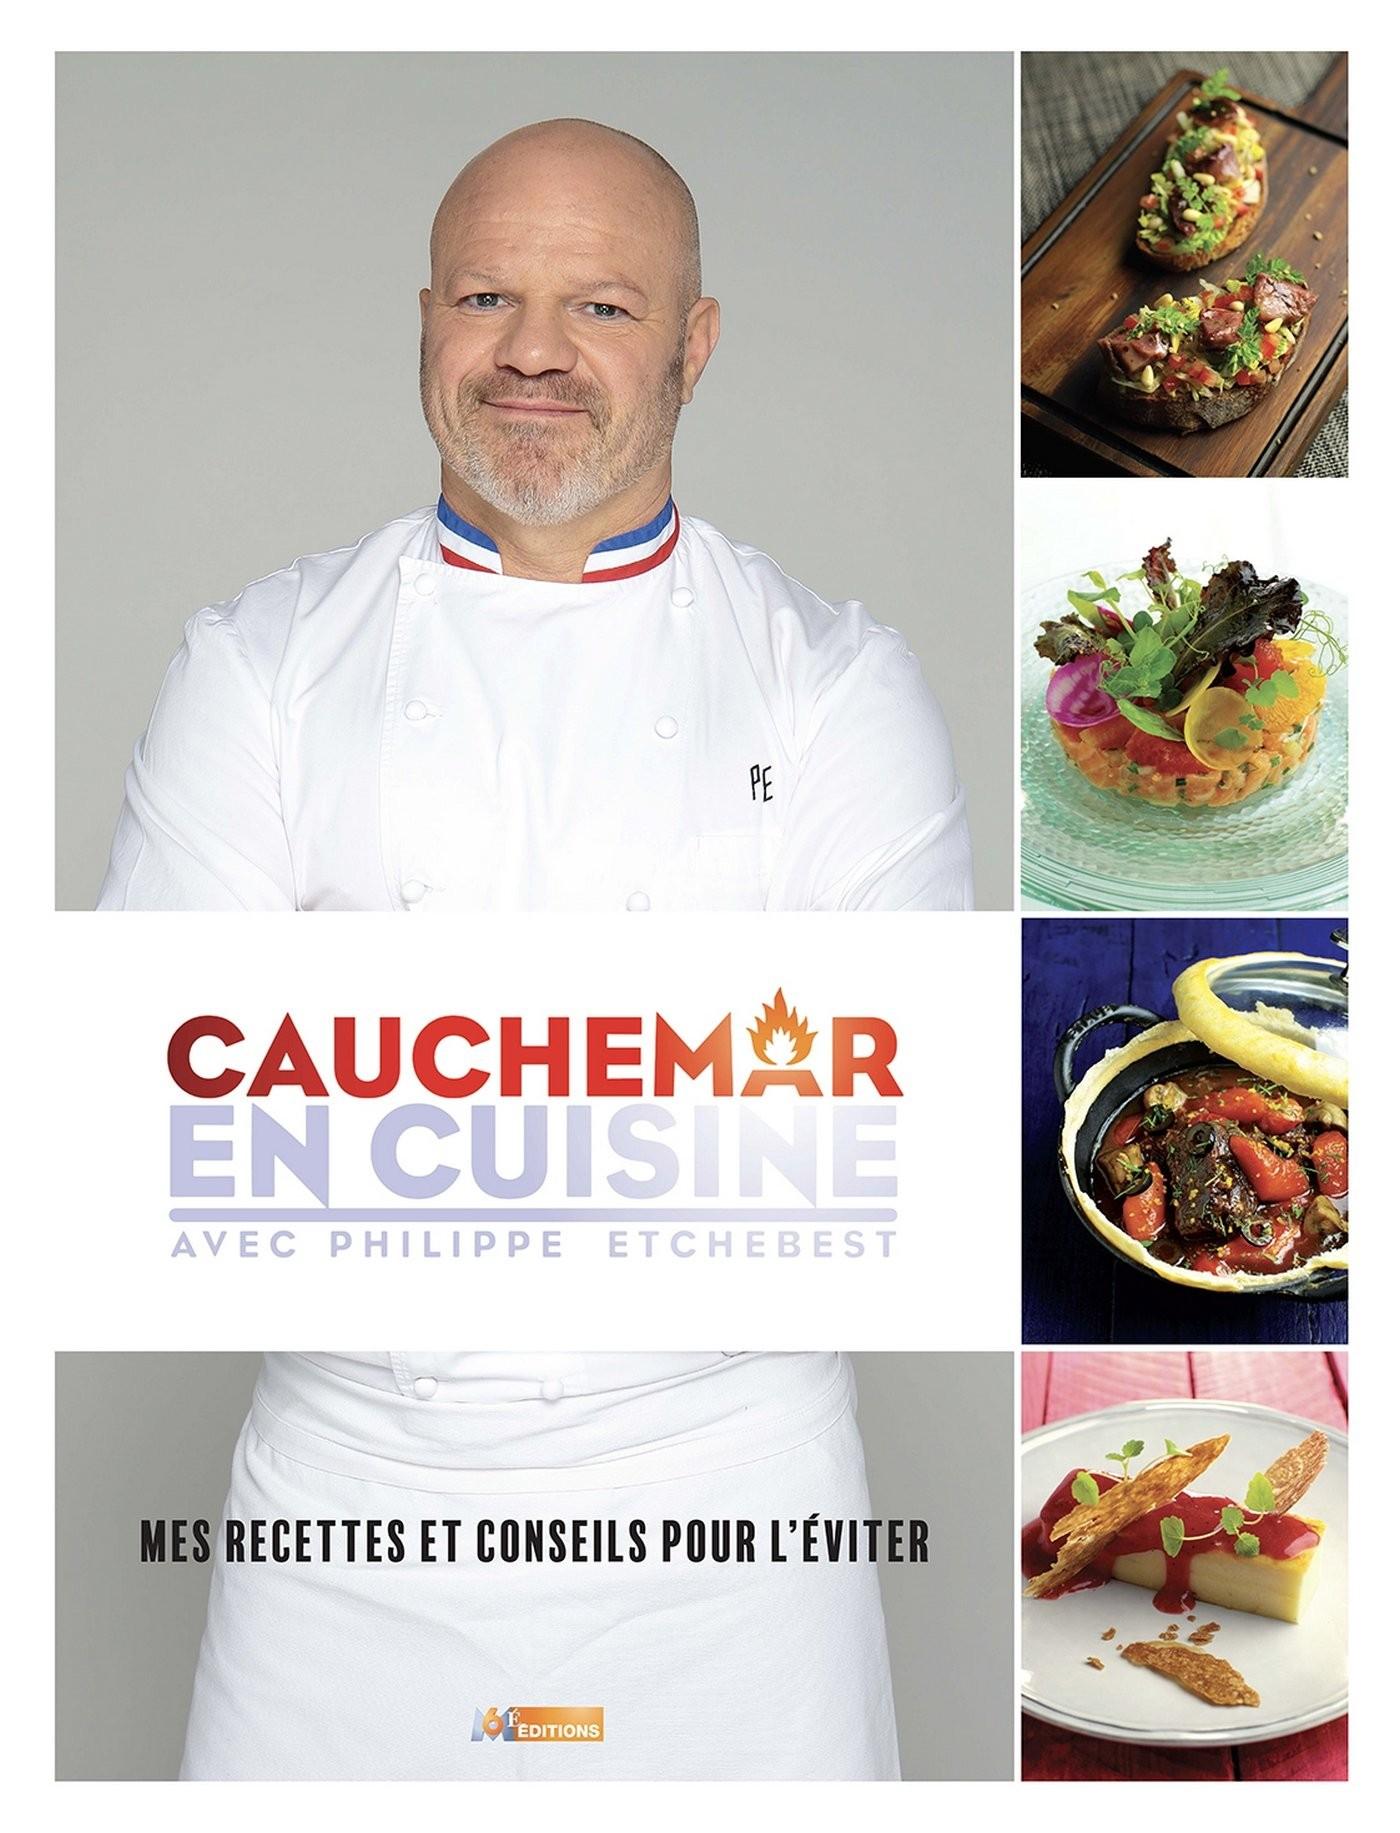 Cauchemar En Cuisine Streaming Philippe Etchebest Frais Photos Amazon top Chef norbert Tarayre Fou De Cuisine norbert Concept